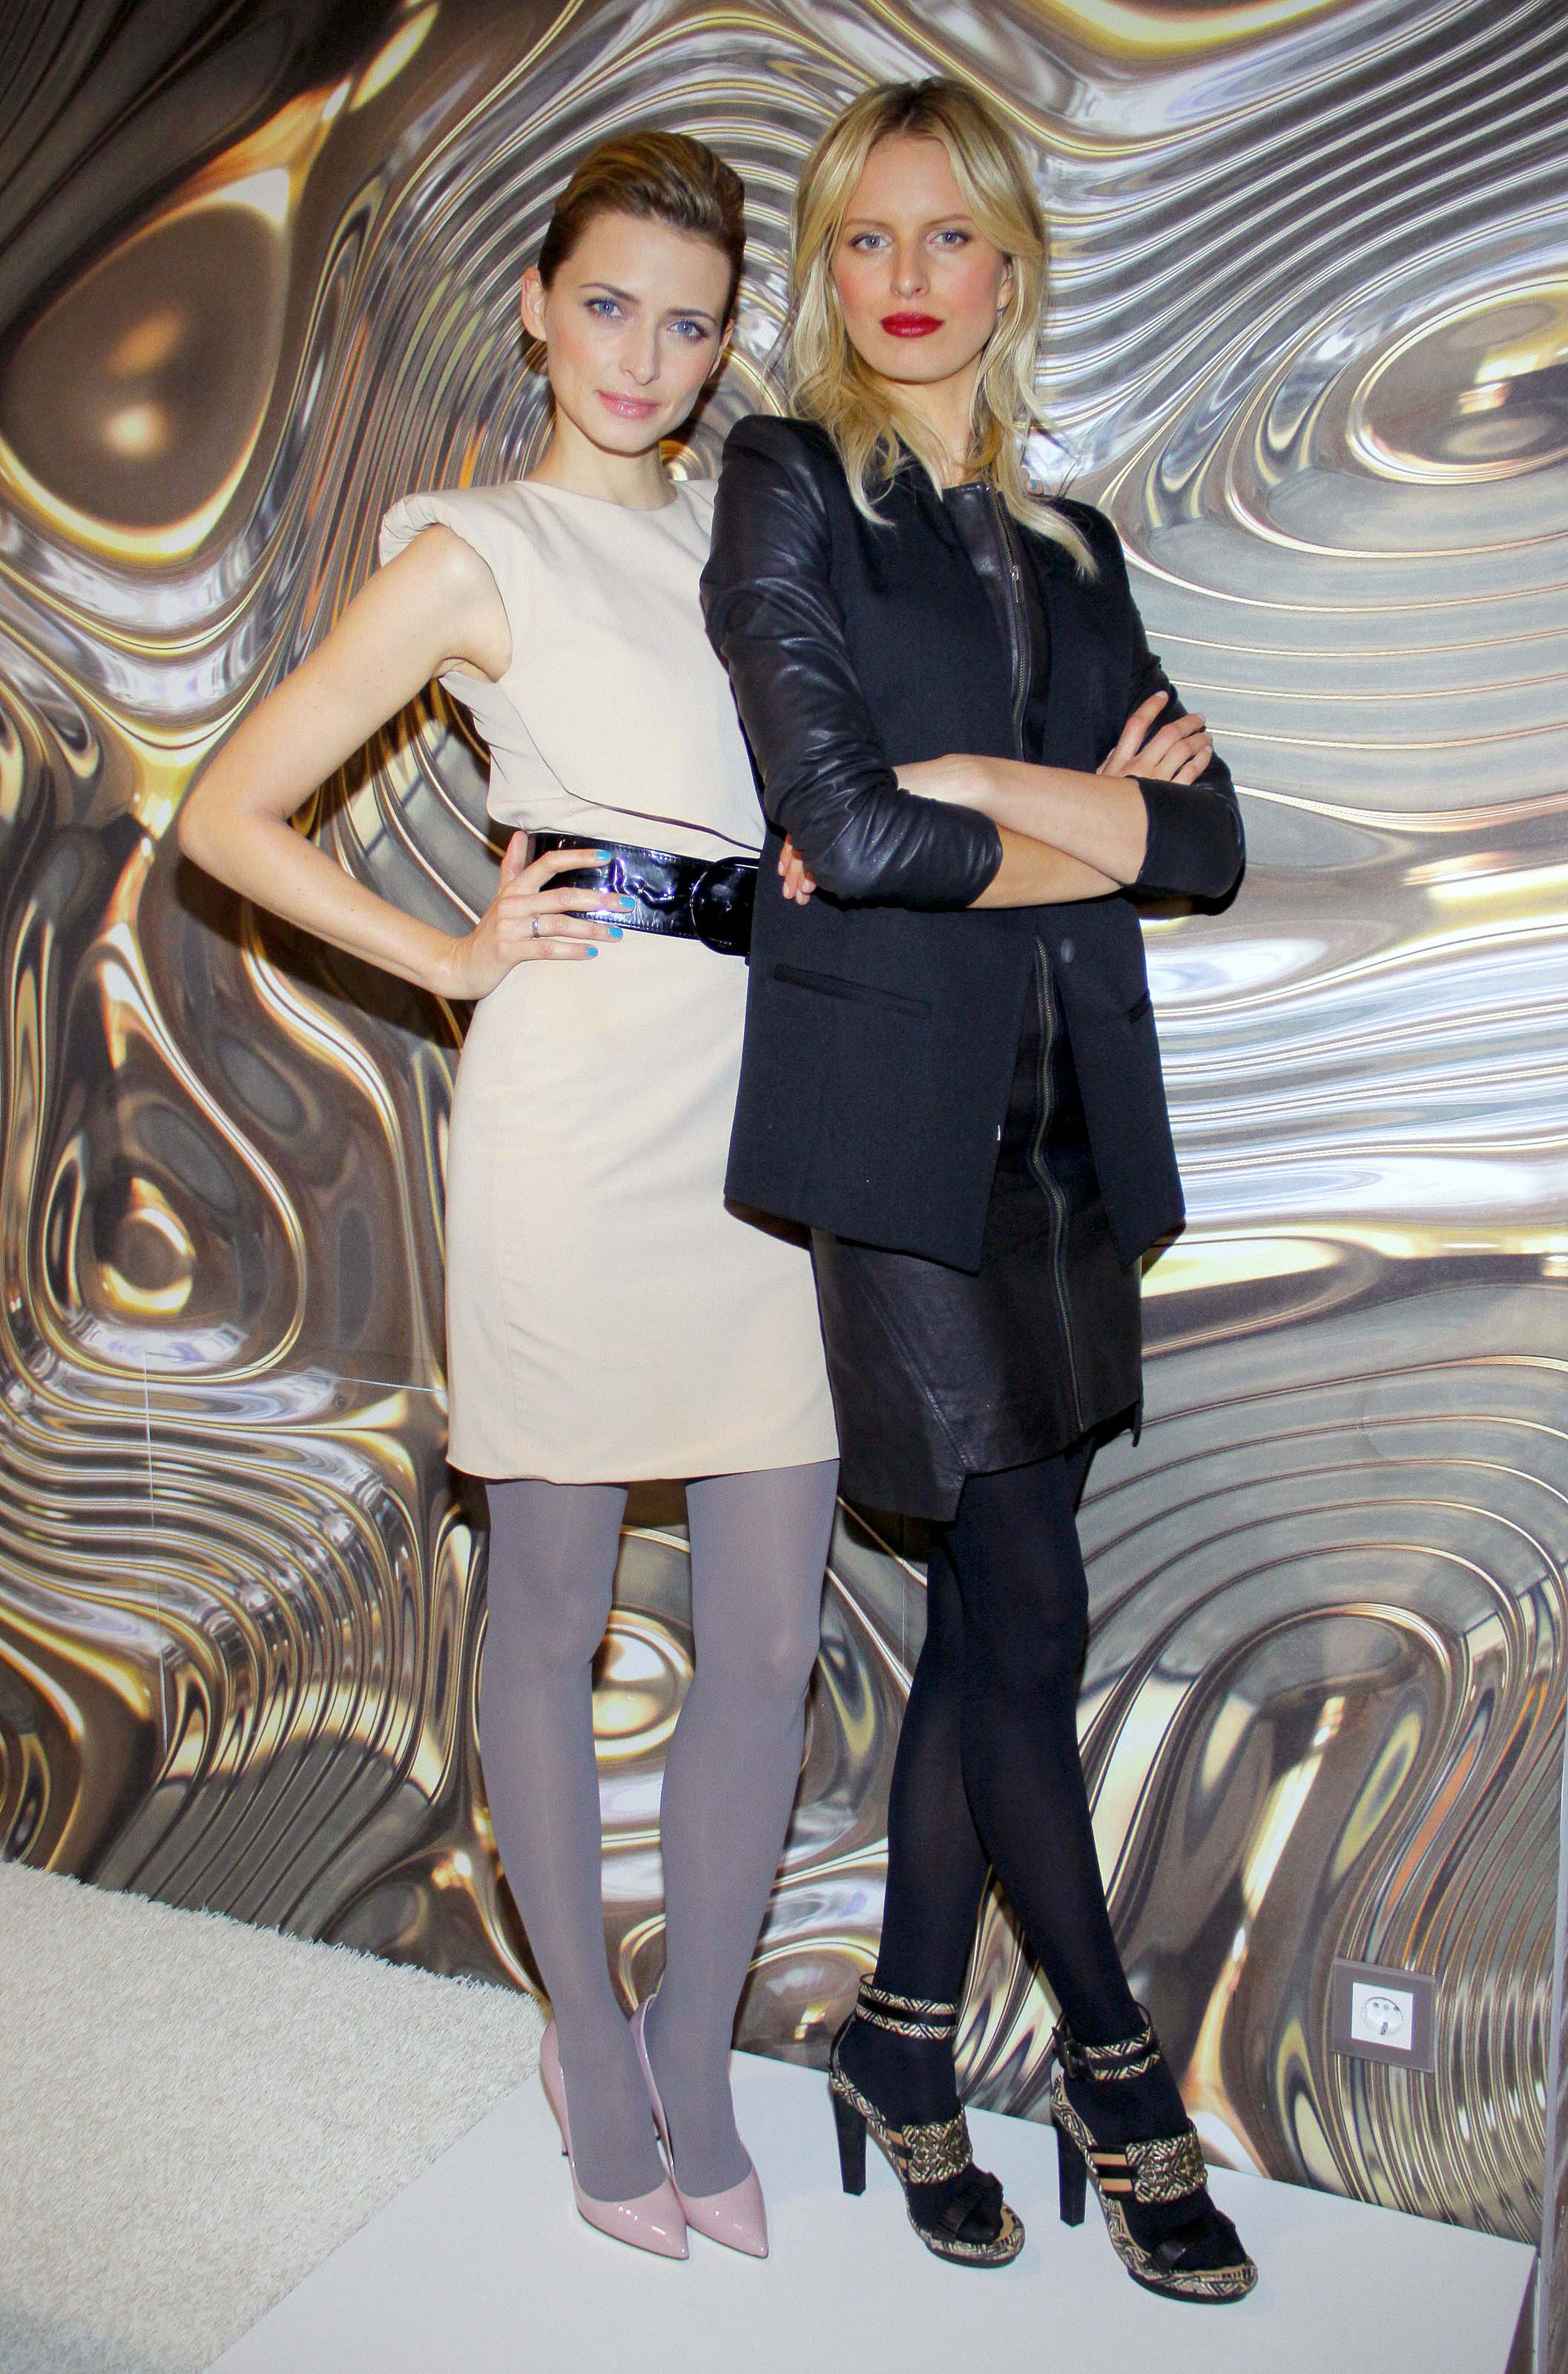 Karolina Kurkova attends Prague Fashion Week 2018